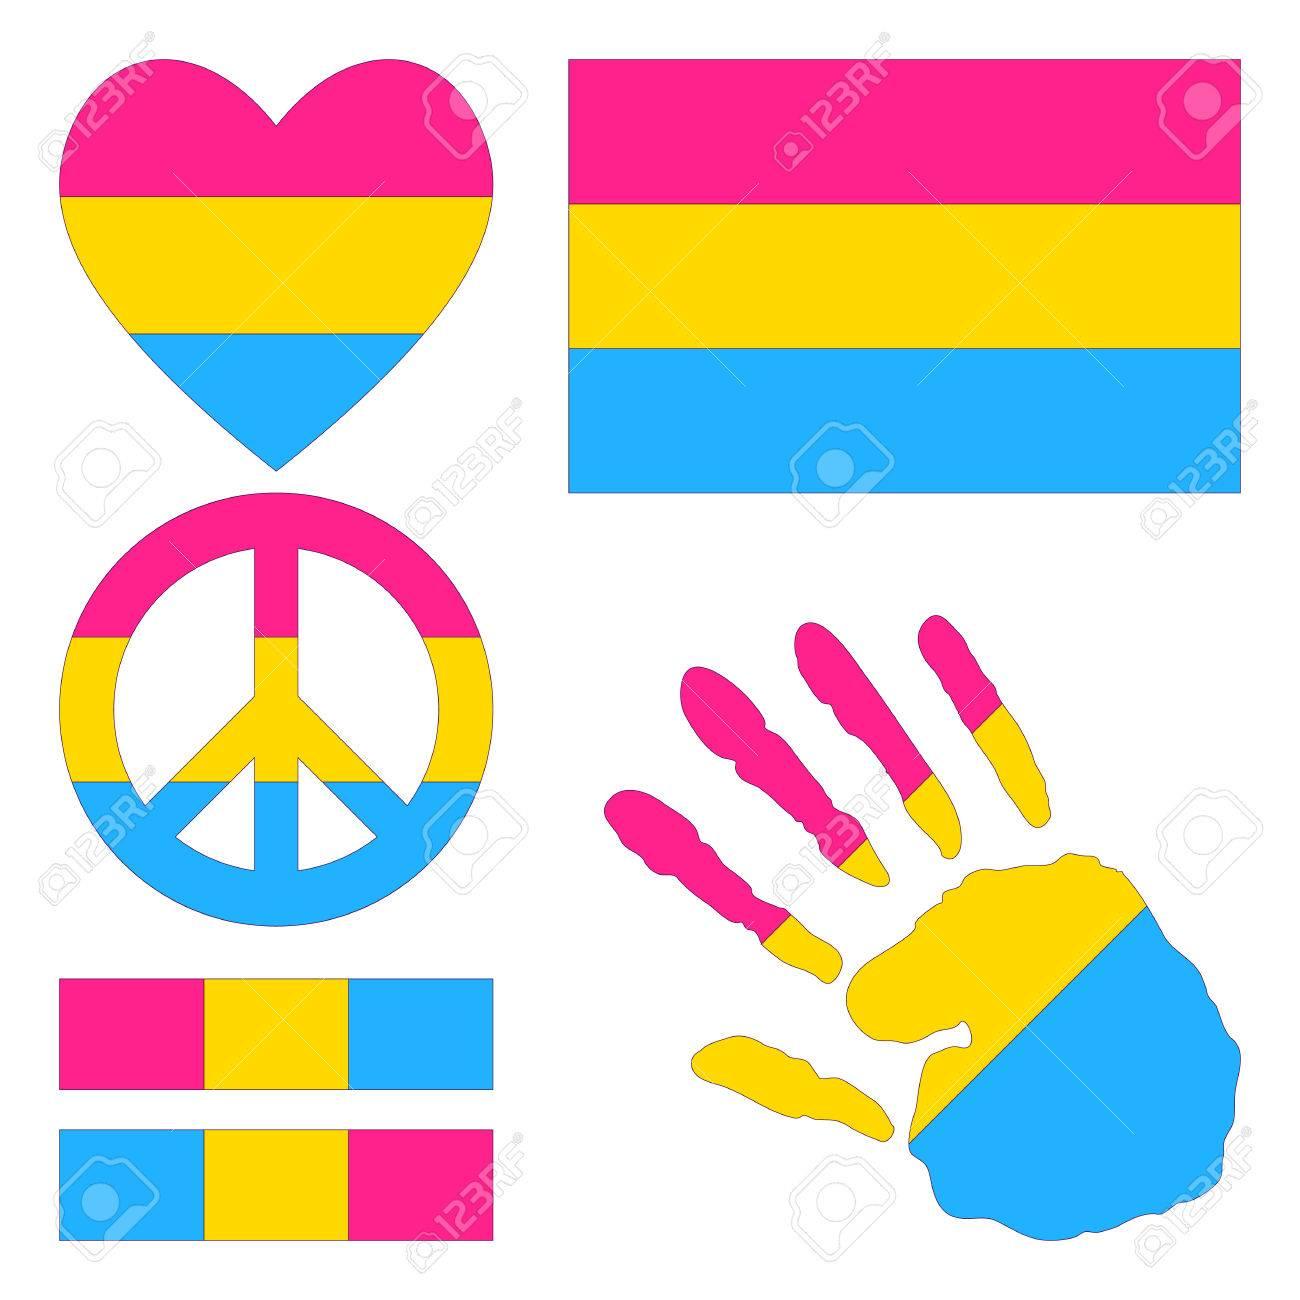 Pansexual flag art